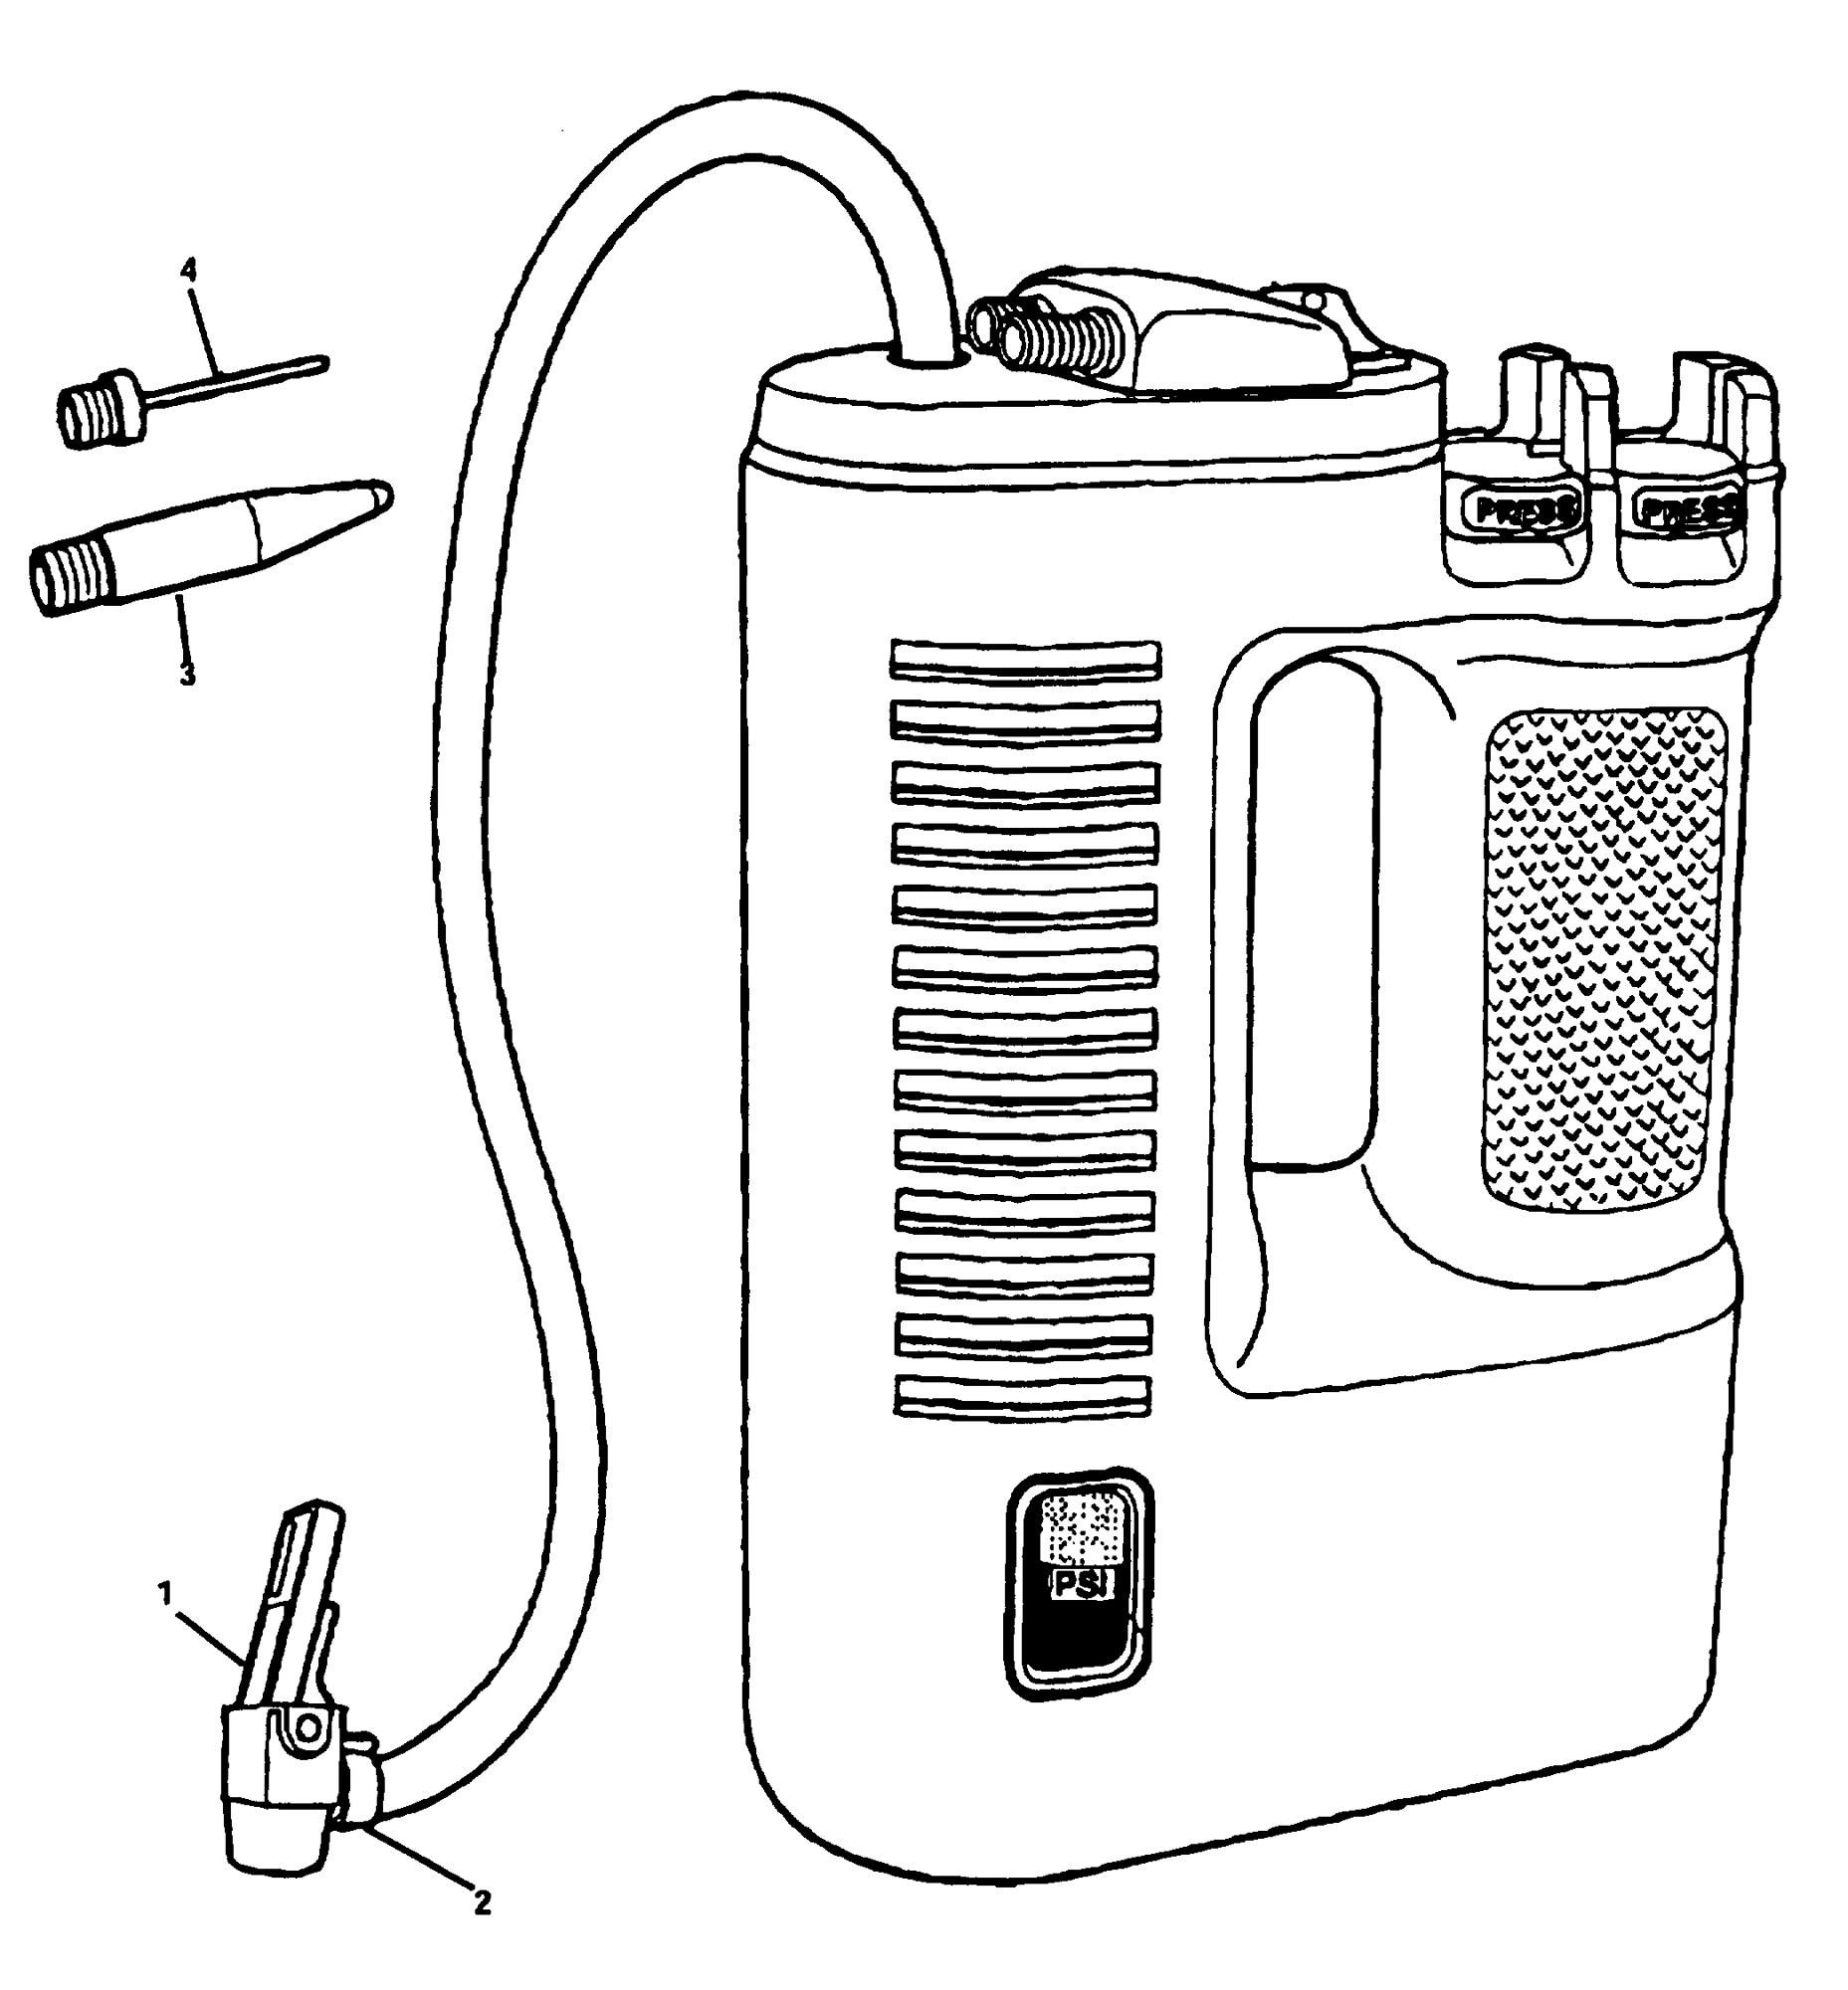 Spares for Black & Decker Vp700 Inflator (type 1) SPARE